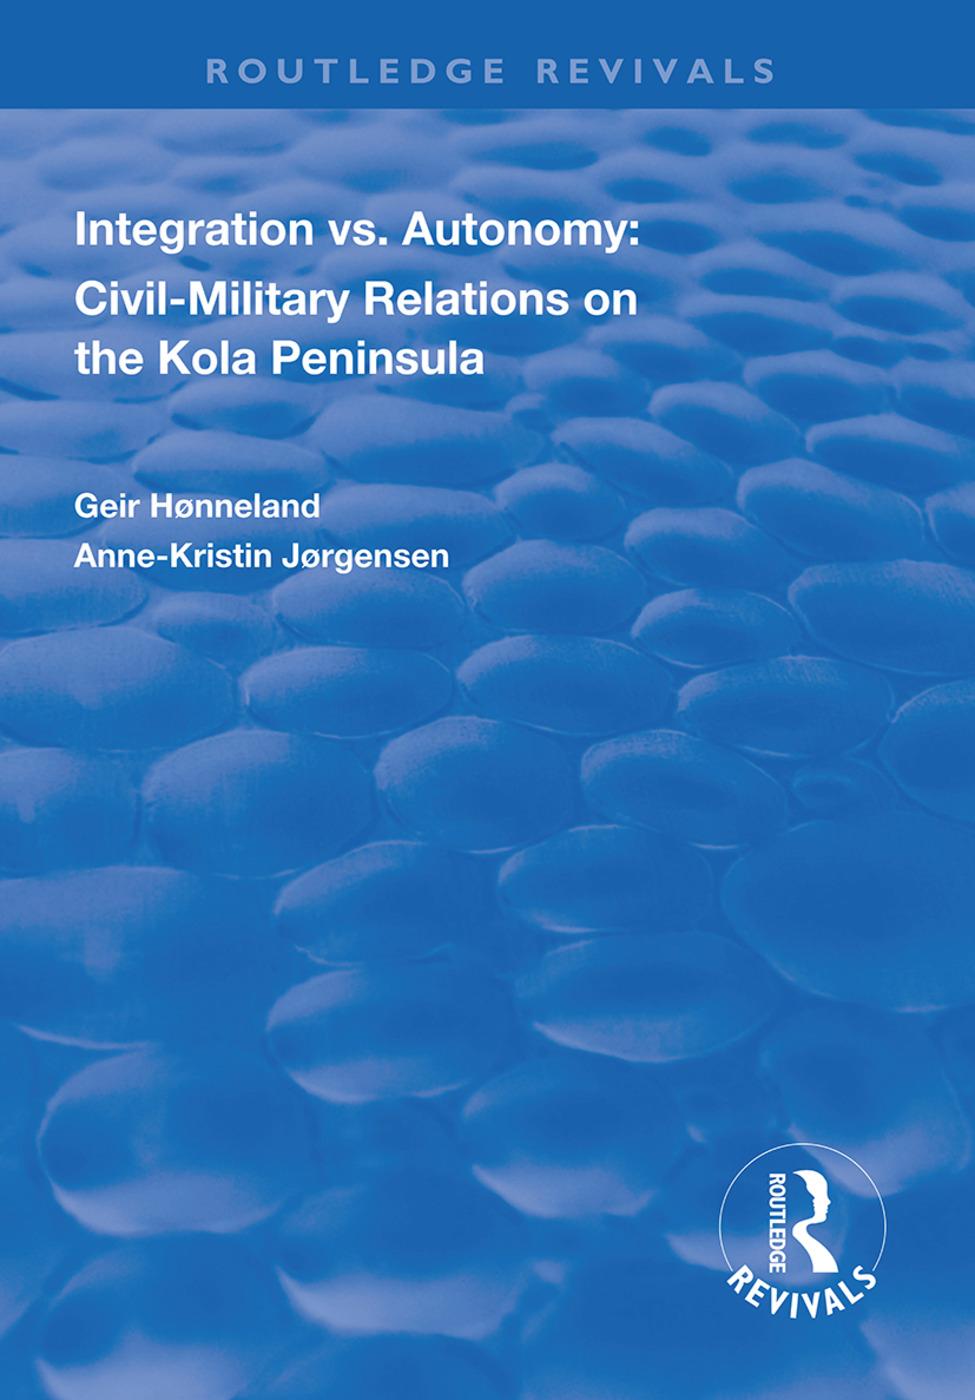 Integration vs. Autonomy: Civil-military Relations on the Kola Peninsula book cover